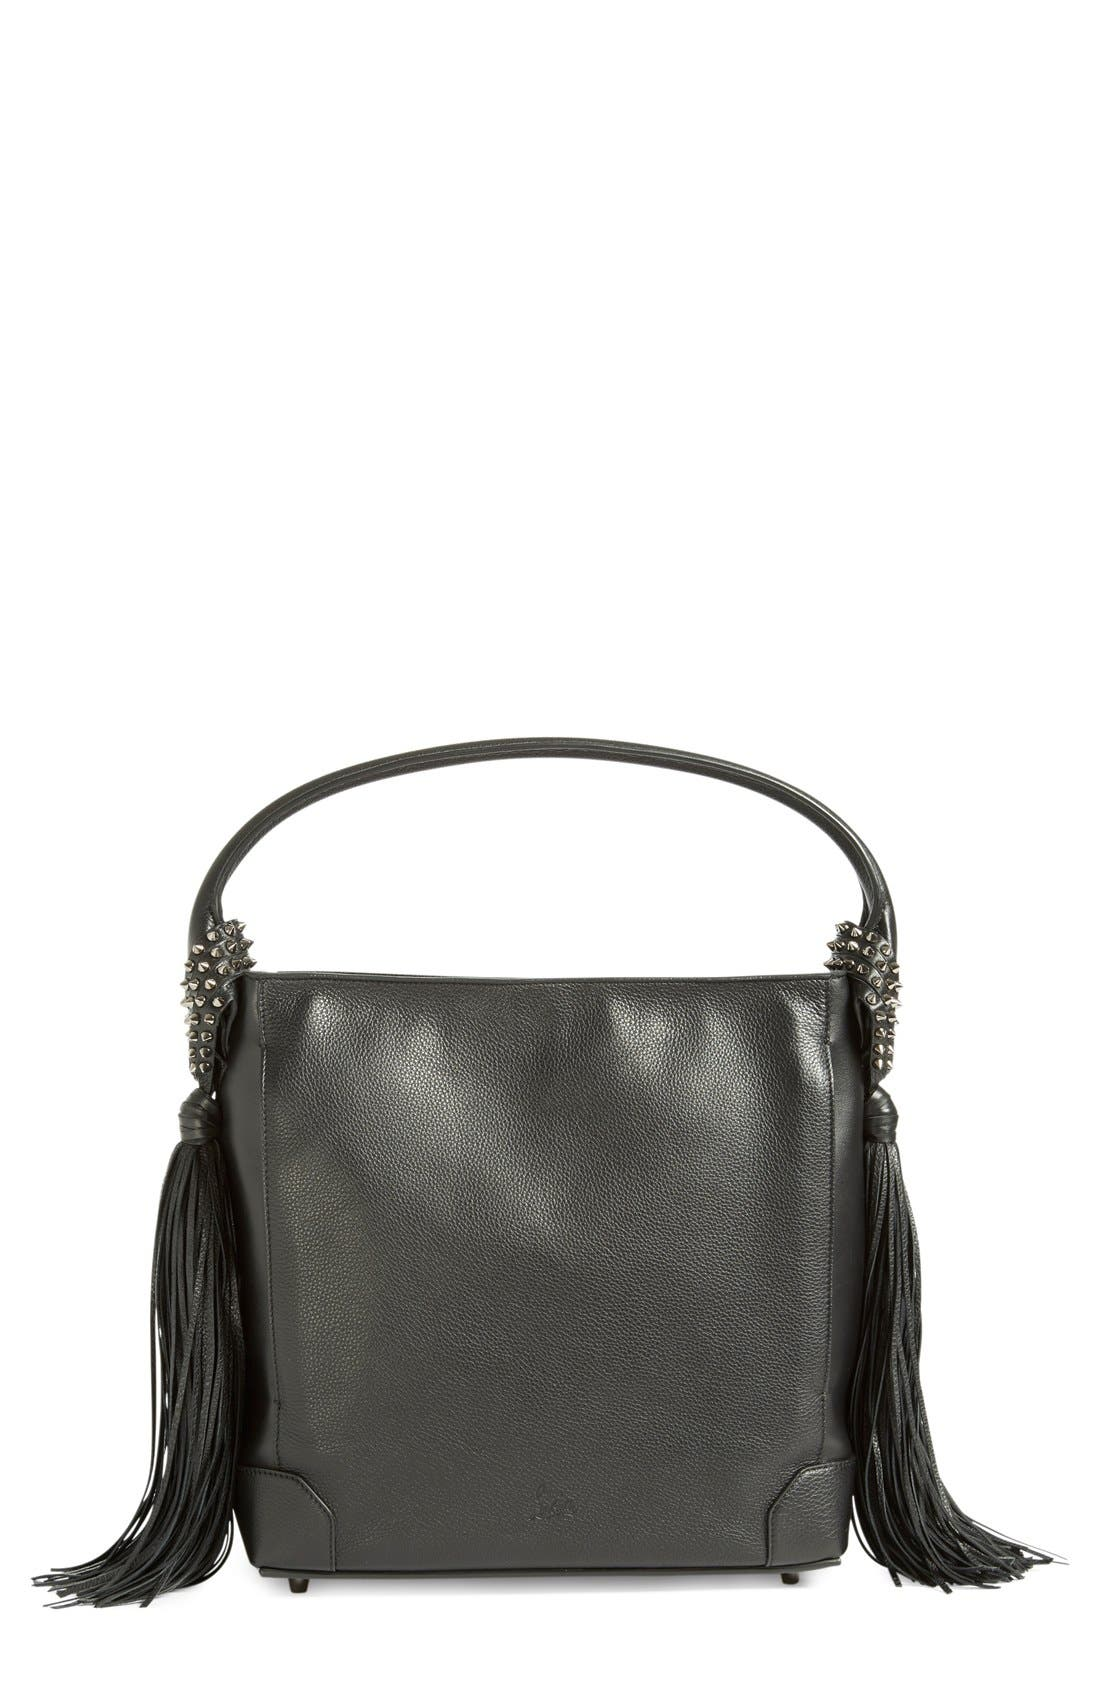 Main Image - Christian Louboutin 'Eloise Empire' Studded Calfskin Leather  Hobo